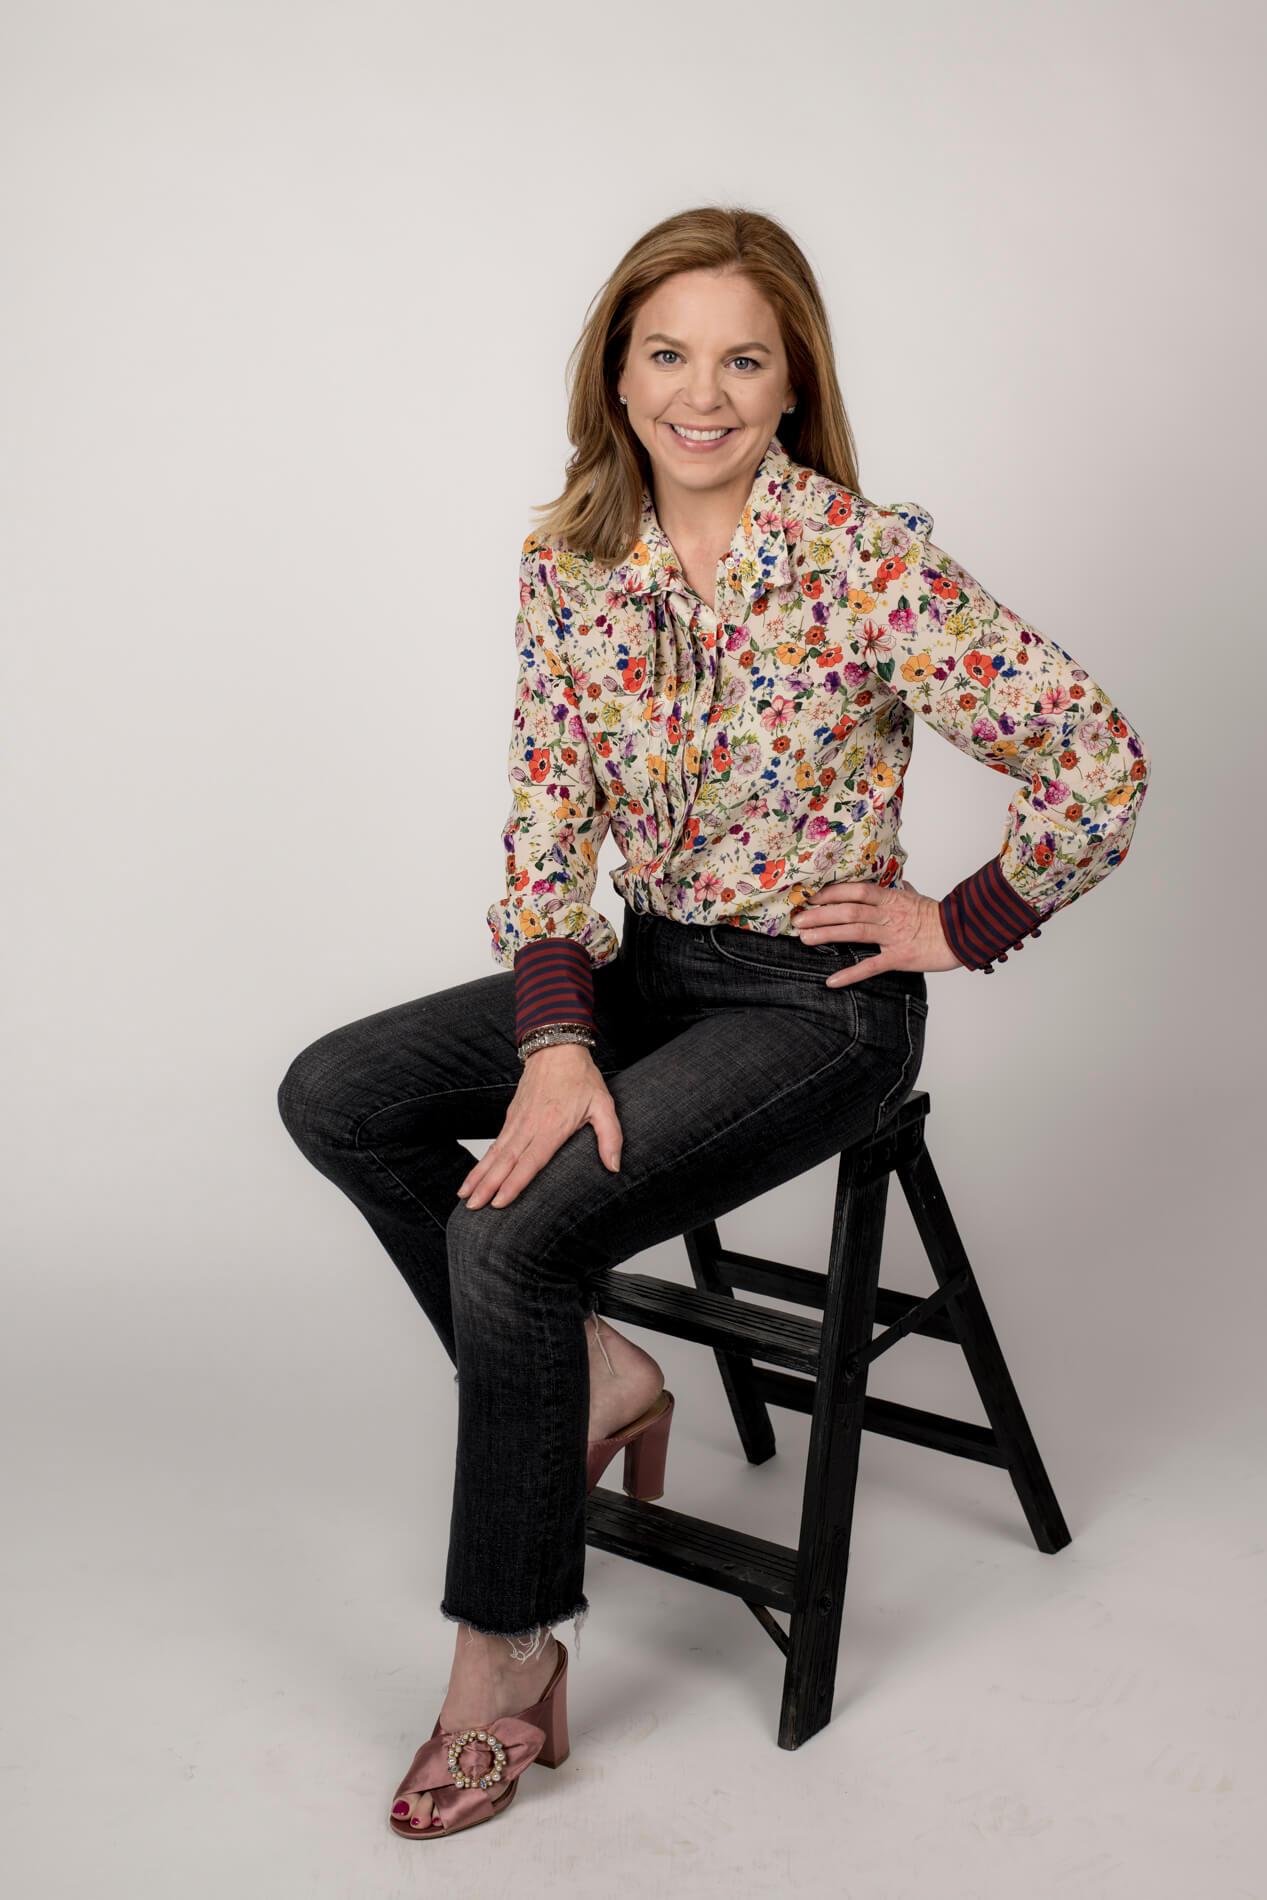 Home designer, Barbara Glass Mullen